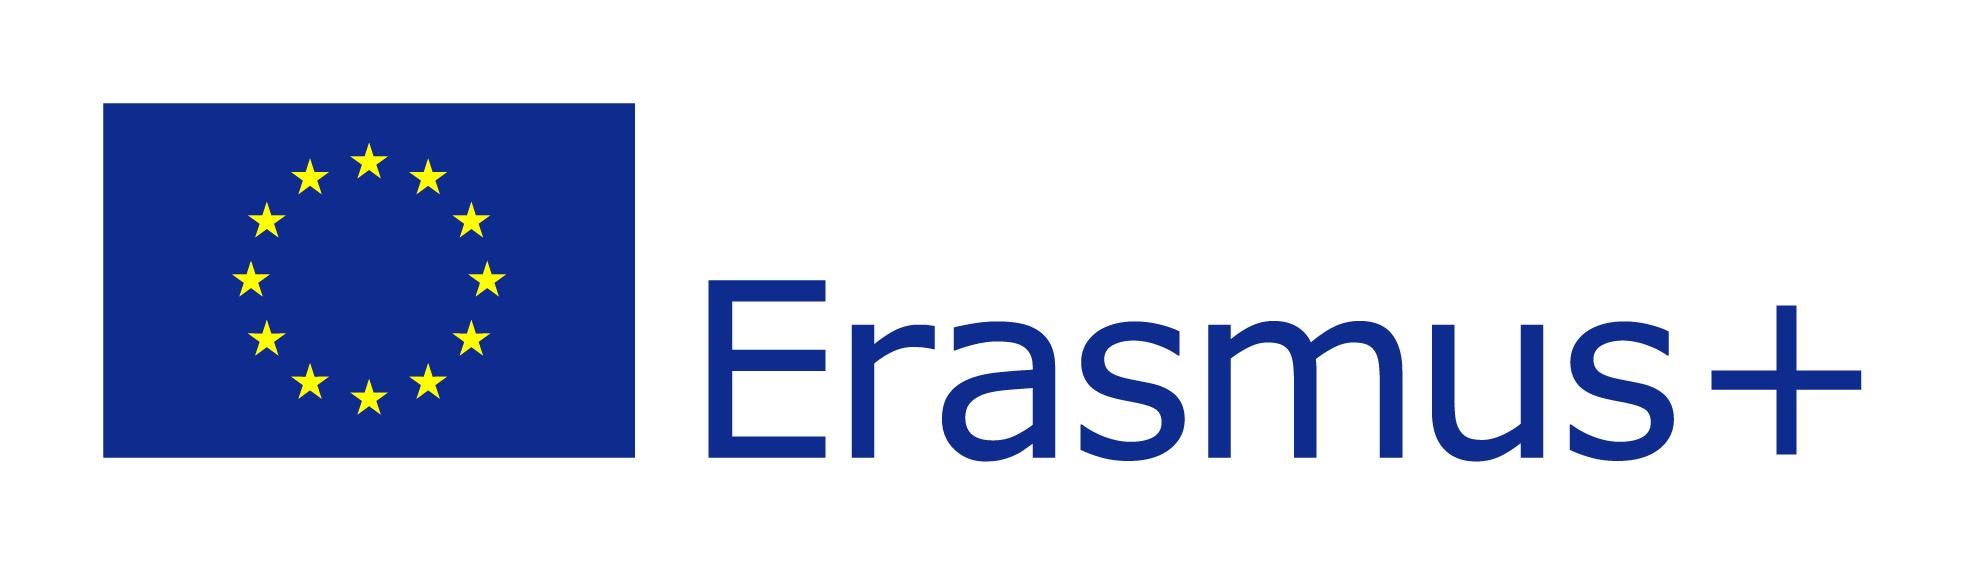 1434006691_eu-flag-erasmus-vect-pos